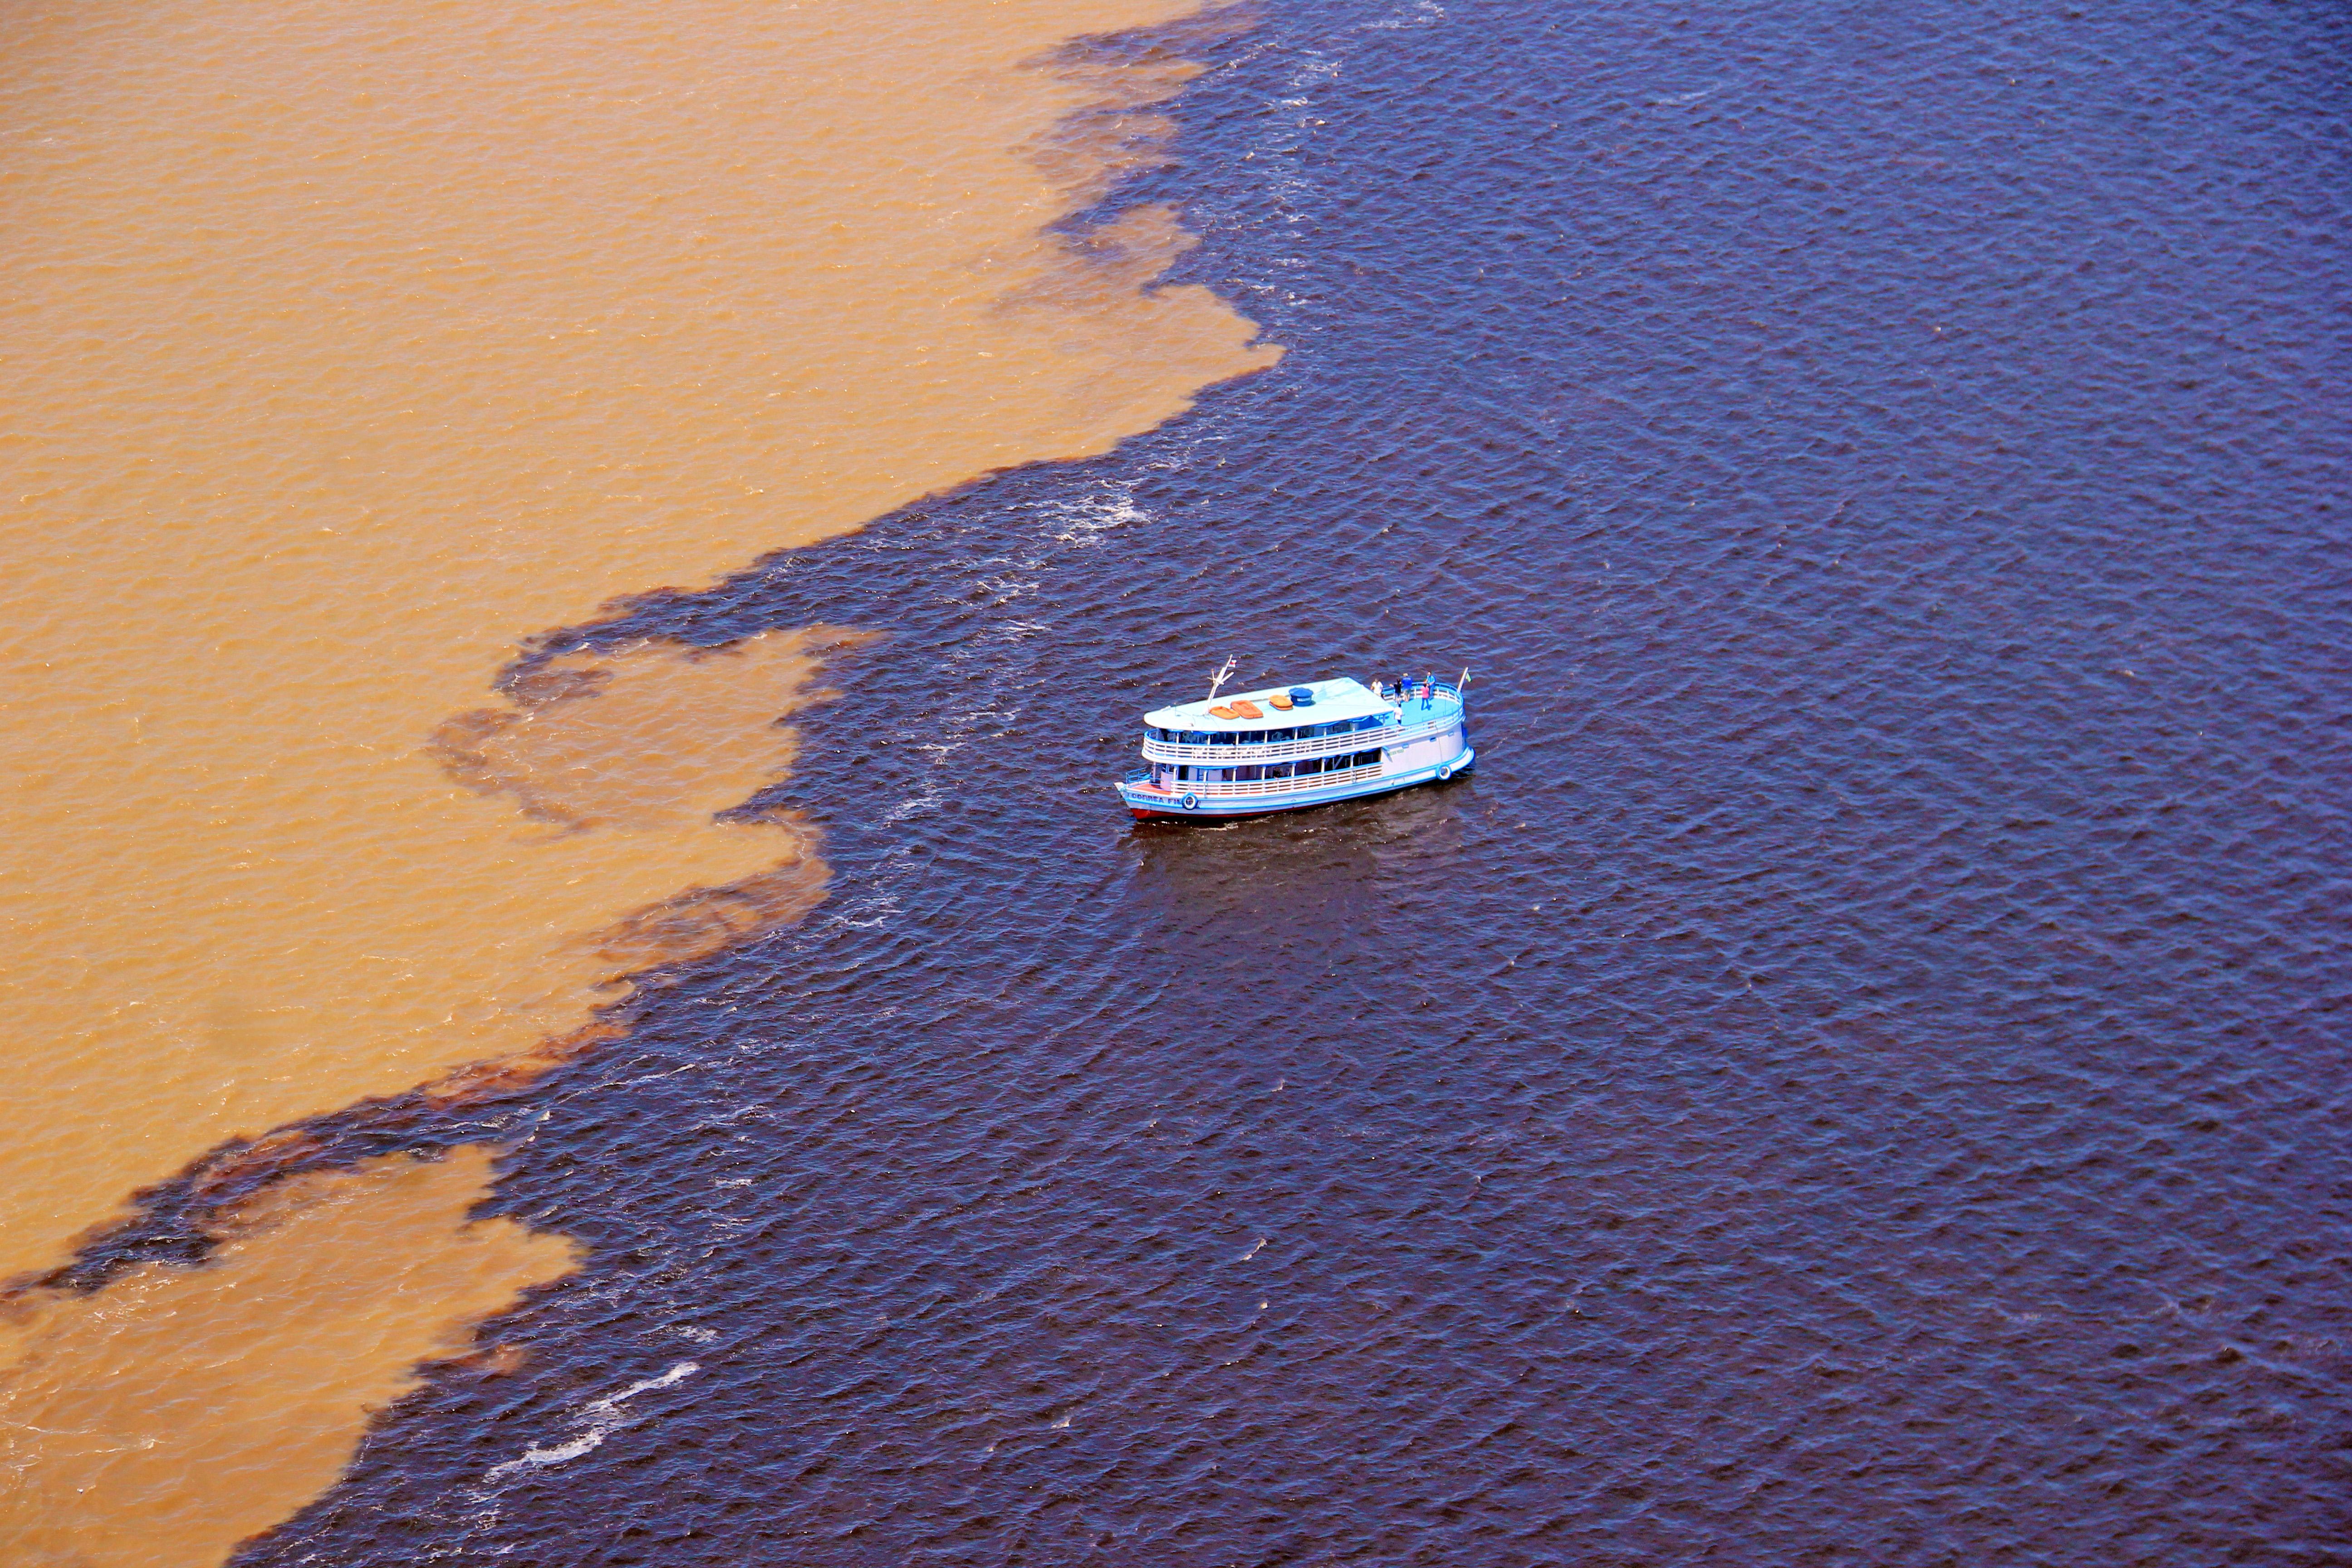 ENCONTRO DAS AGUAS, Rio Negro, Amazonas - FOTO JPLIMA - AGOSTO2013 (2)